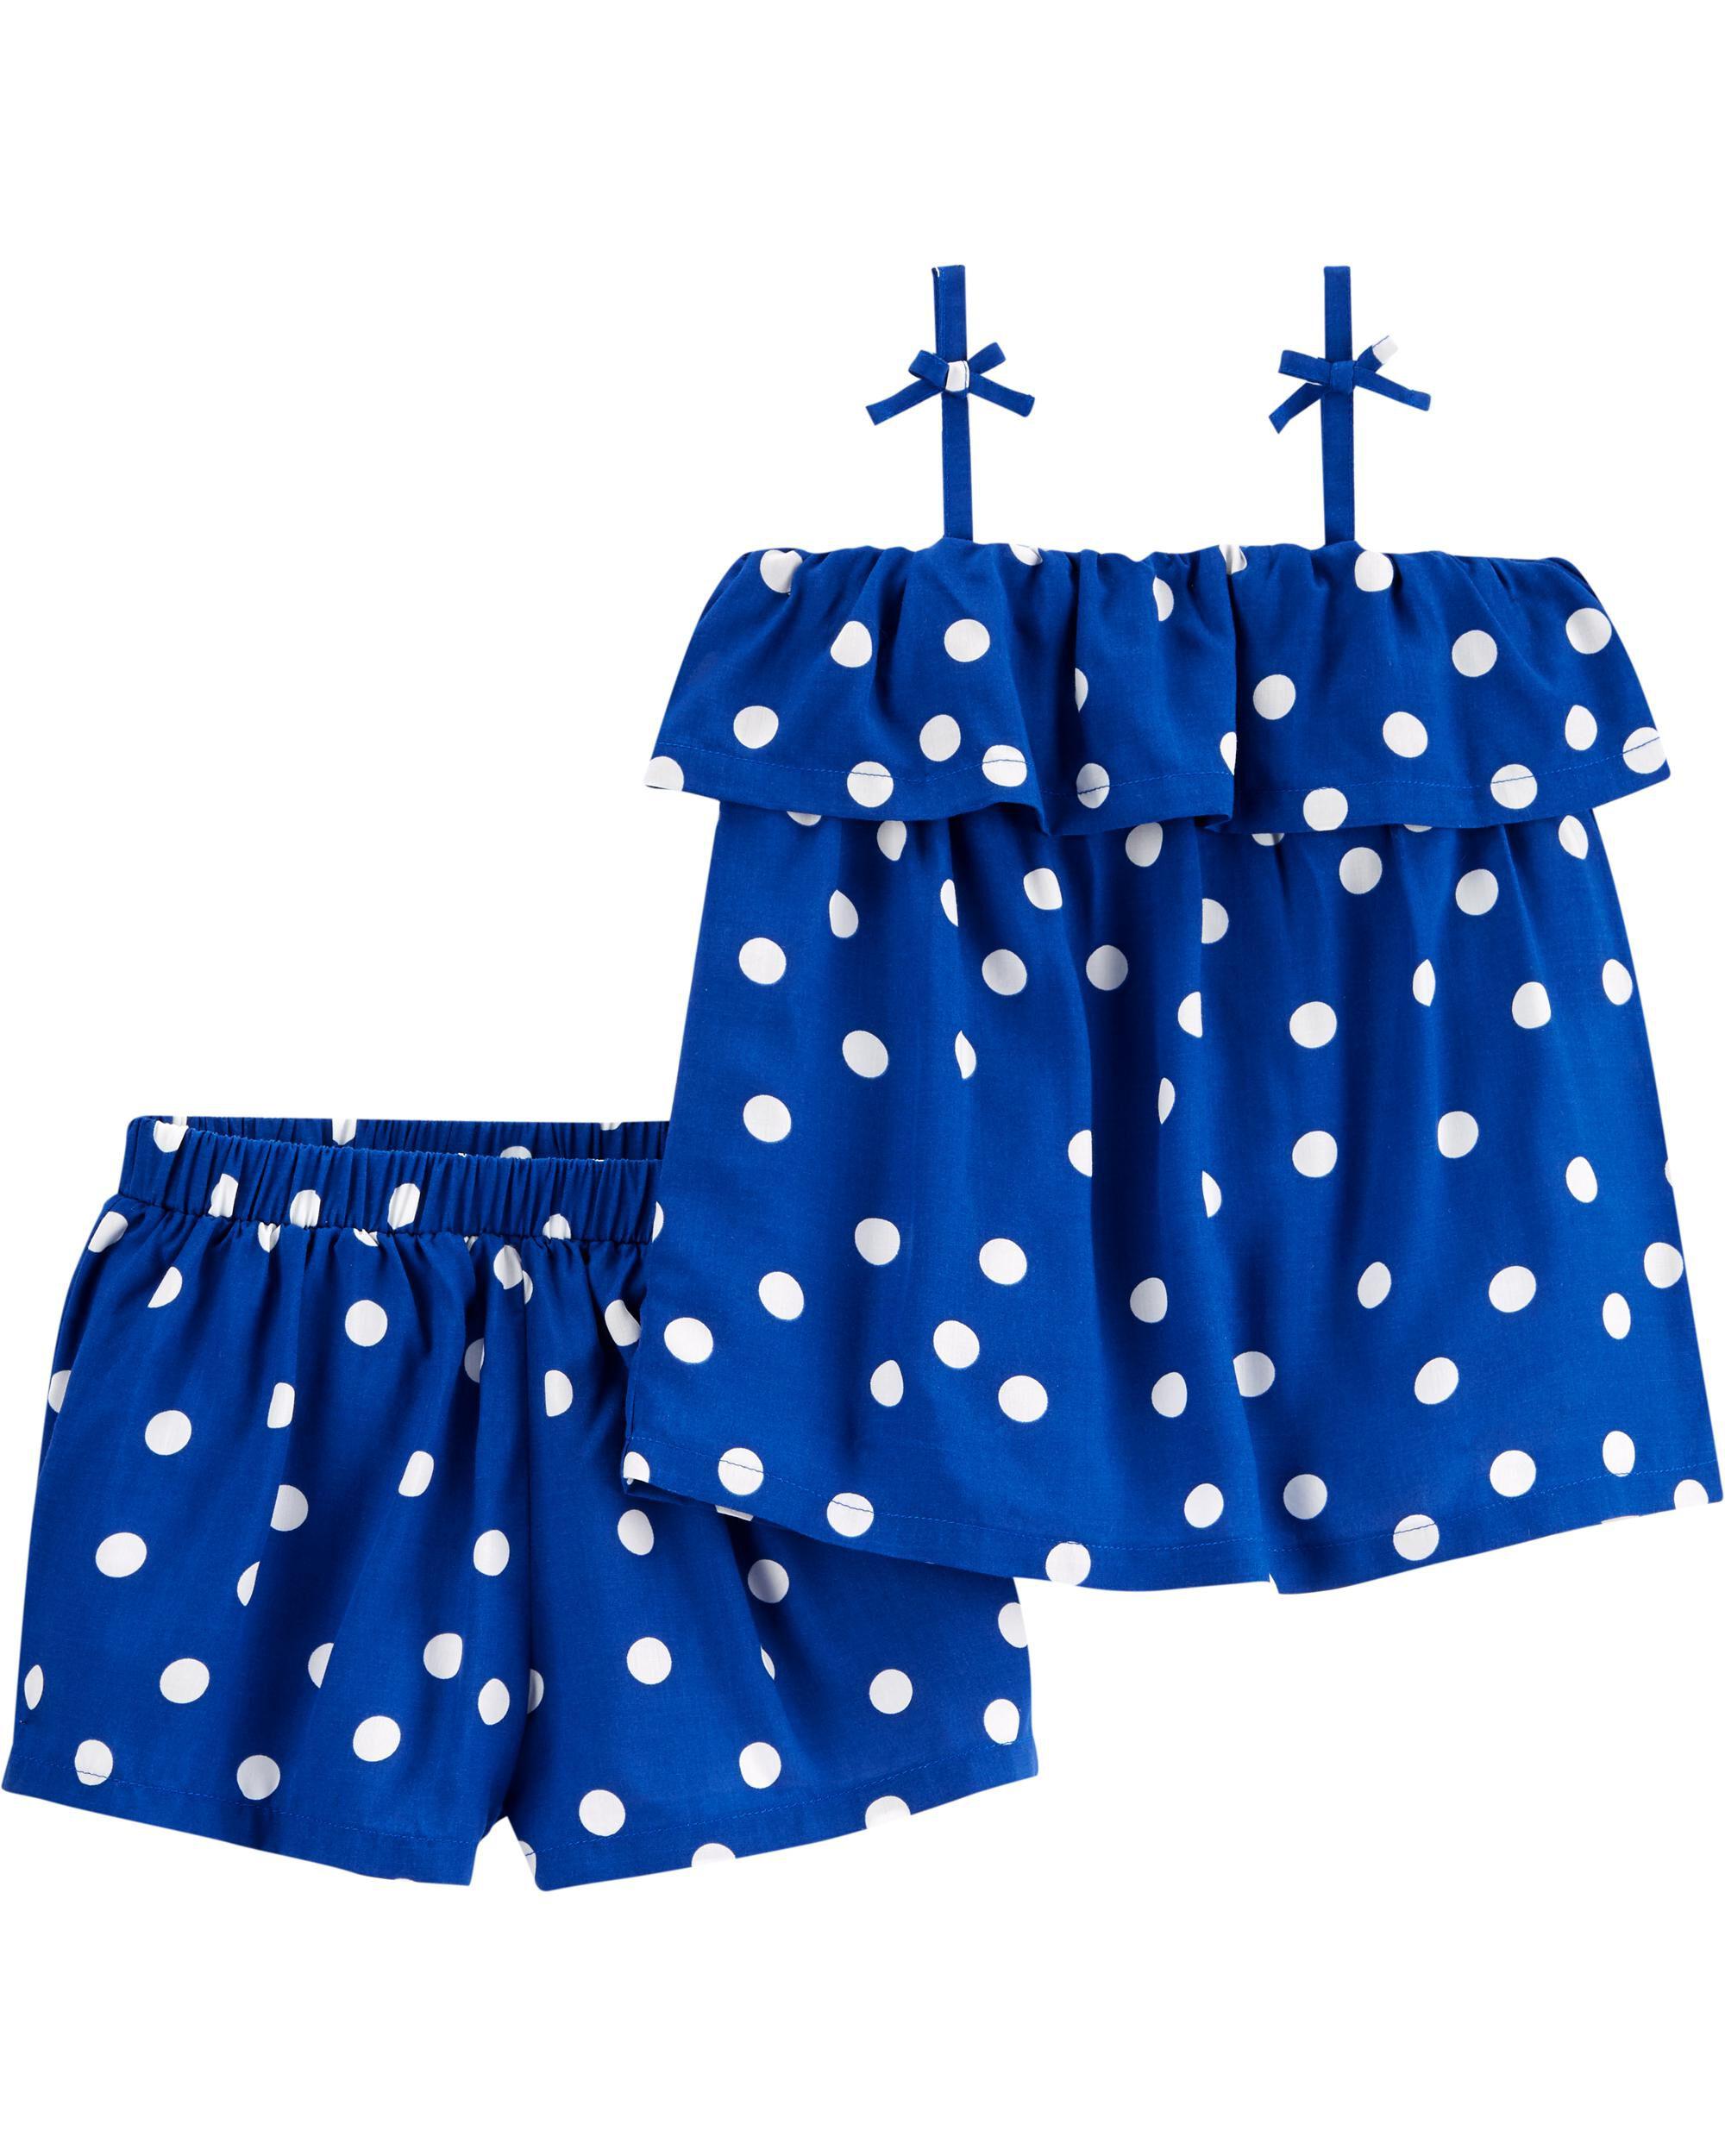 *DOORBUSTER* 2-Piece Polka Dot Outfit Set